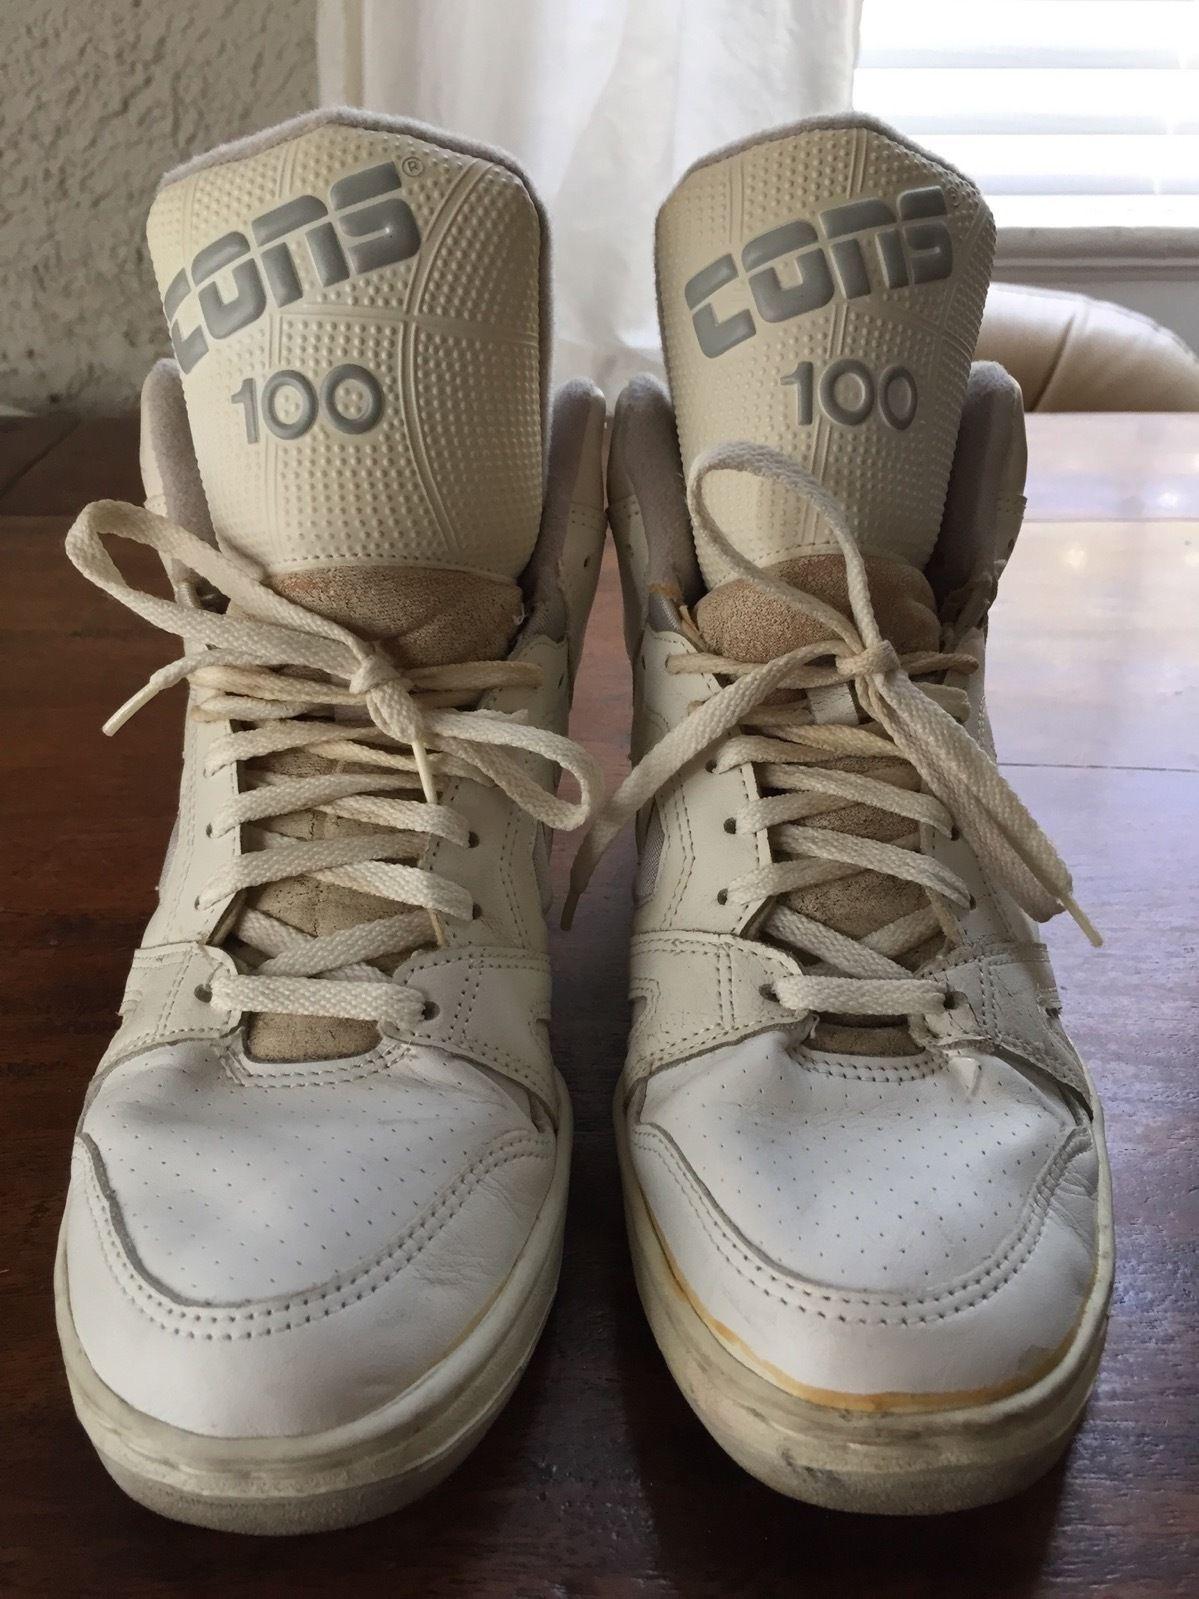 7f470f7b8b95 Shoes Sneakers · Size 10 · Tennis · Converse · http   www.ebay.com itm  Vintage-80s-